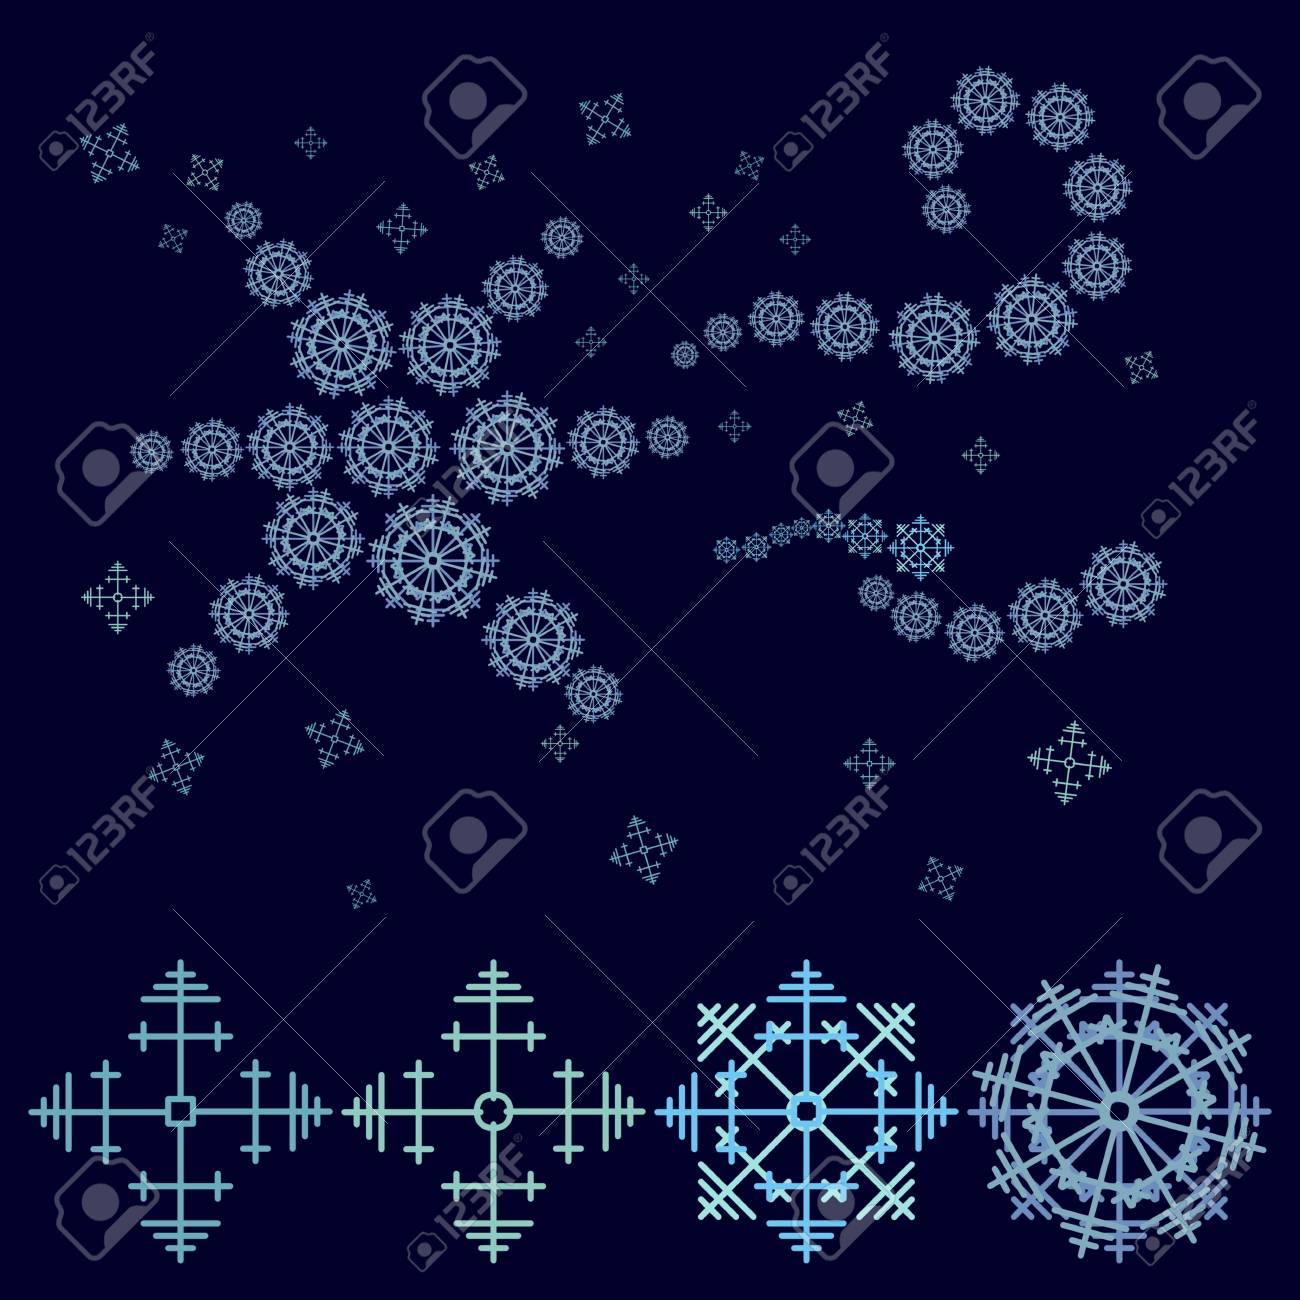 Fabuleux Decorativa Blu Stelle Composto Da Fiocchi Di Neve - Grafica  XR66